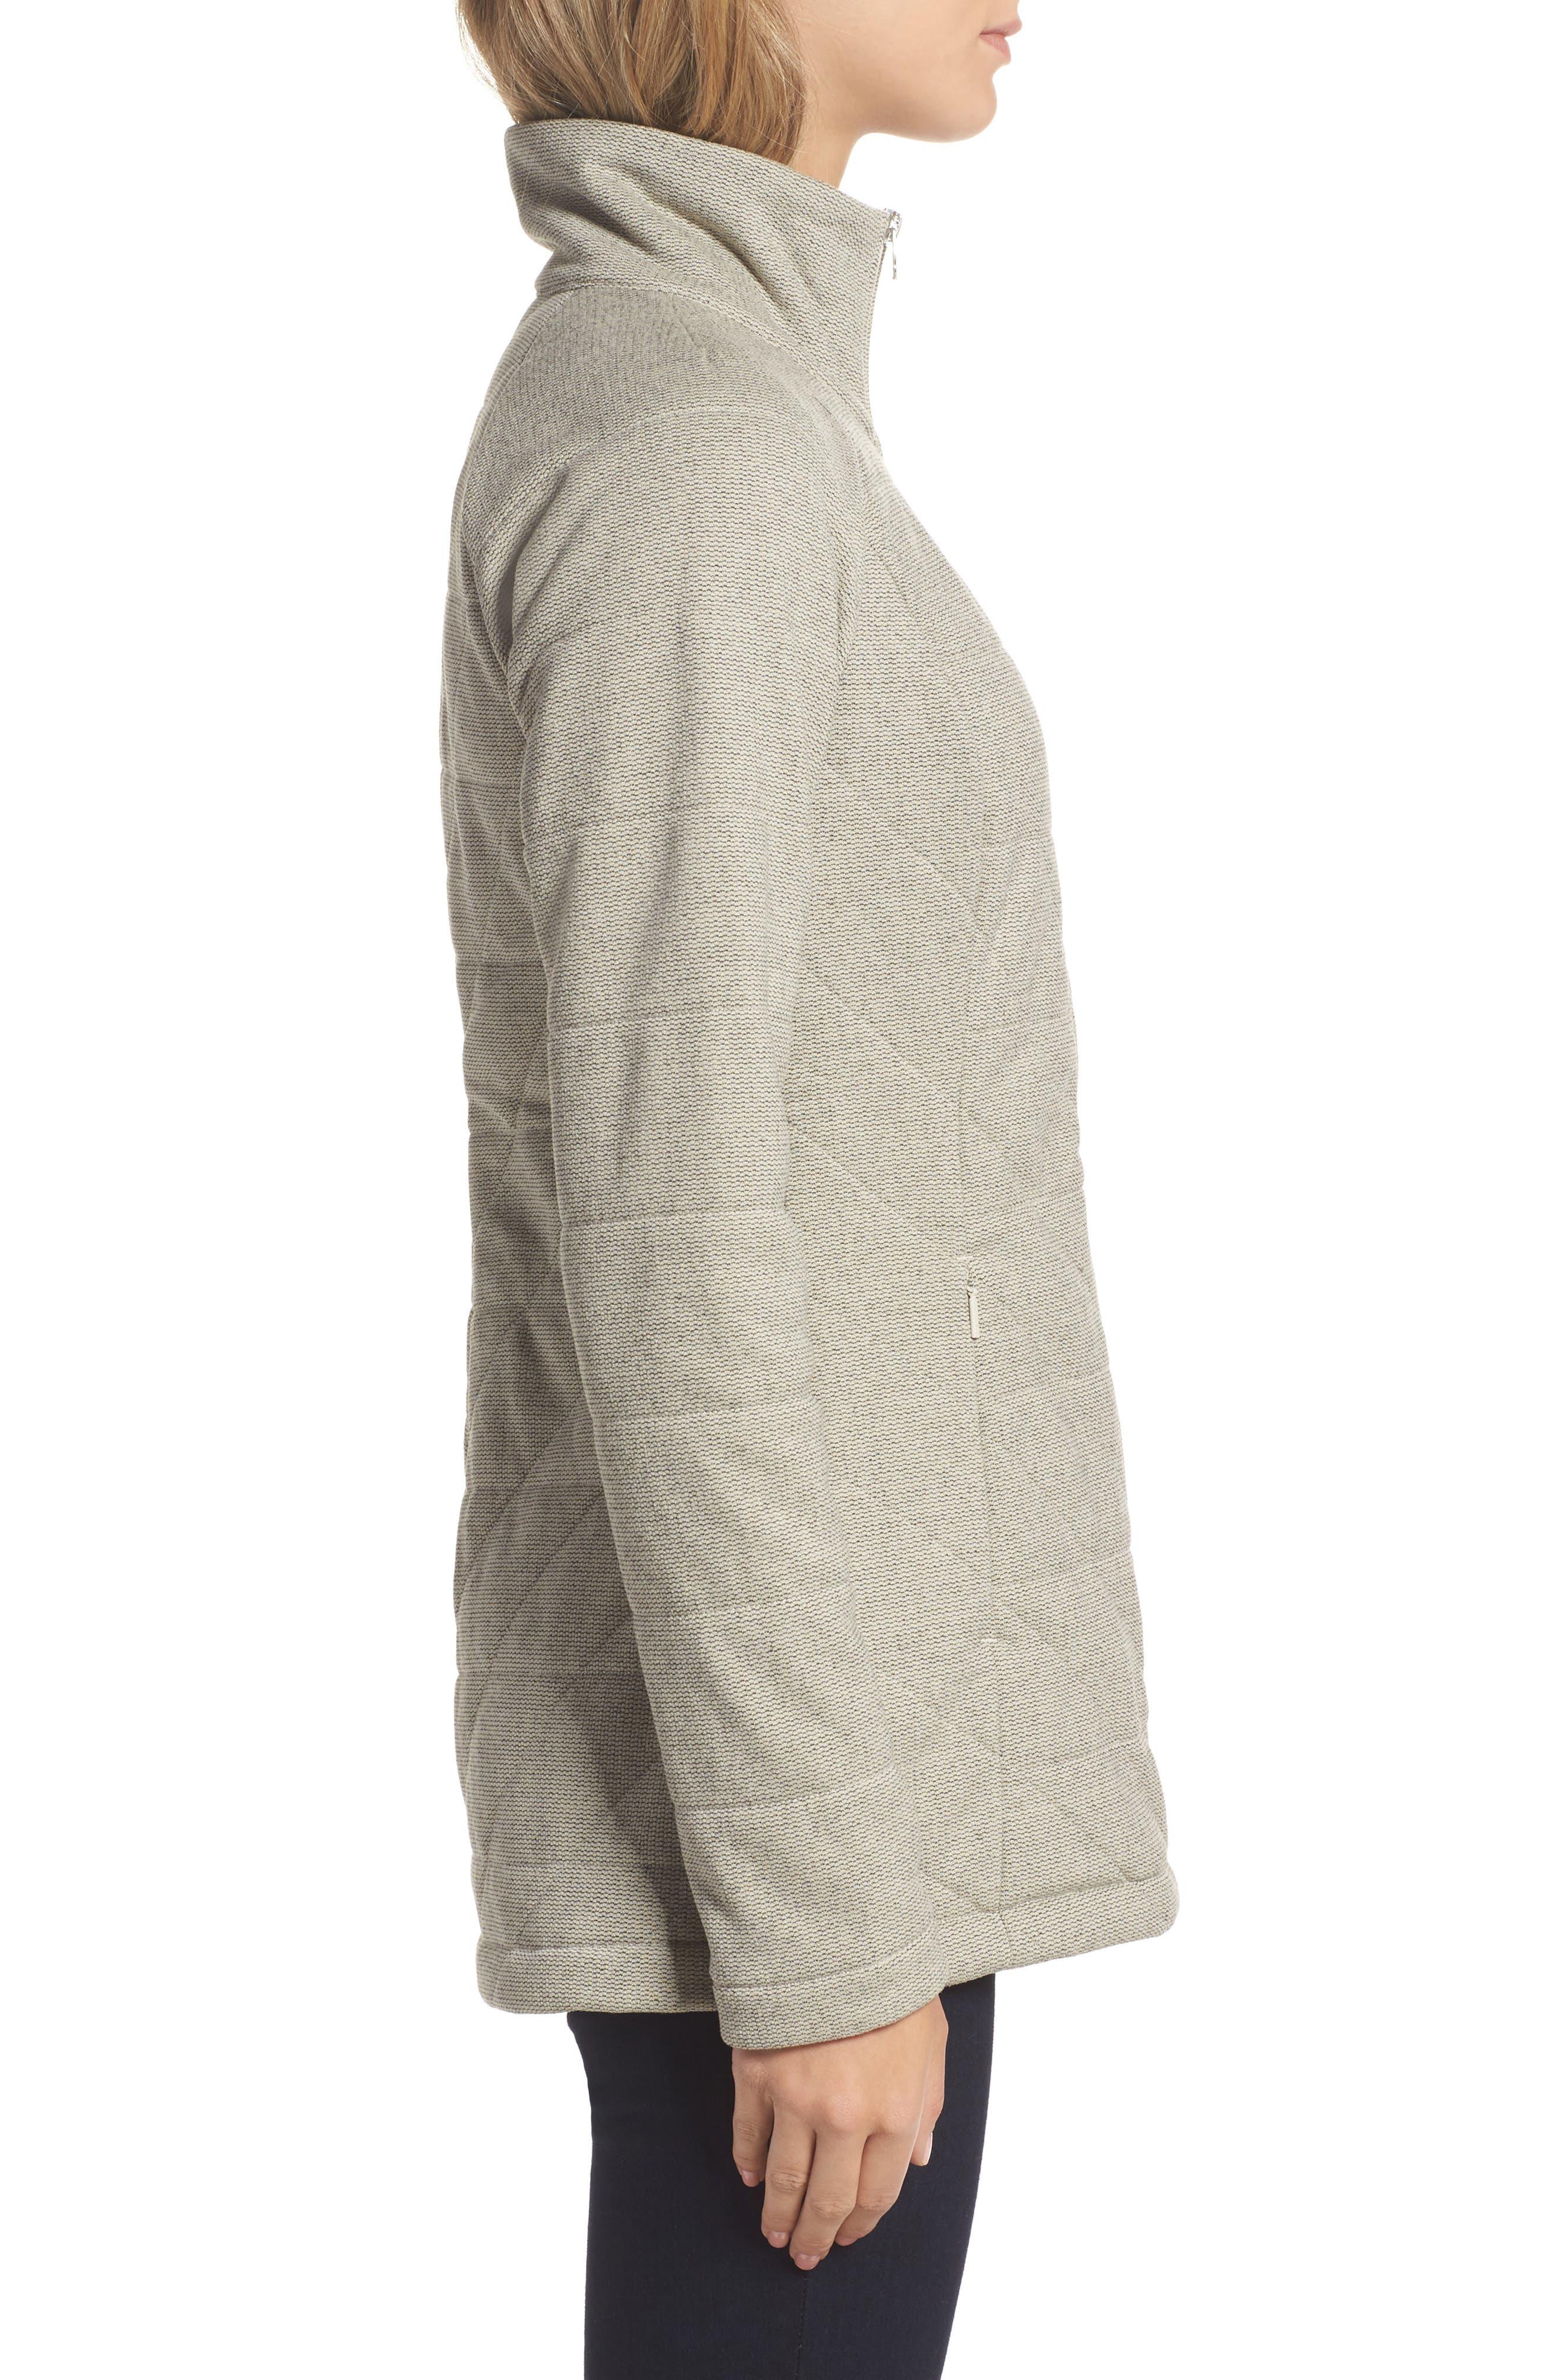 Alternate Image 3  - The North Face Fleece Jacket